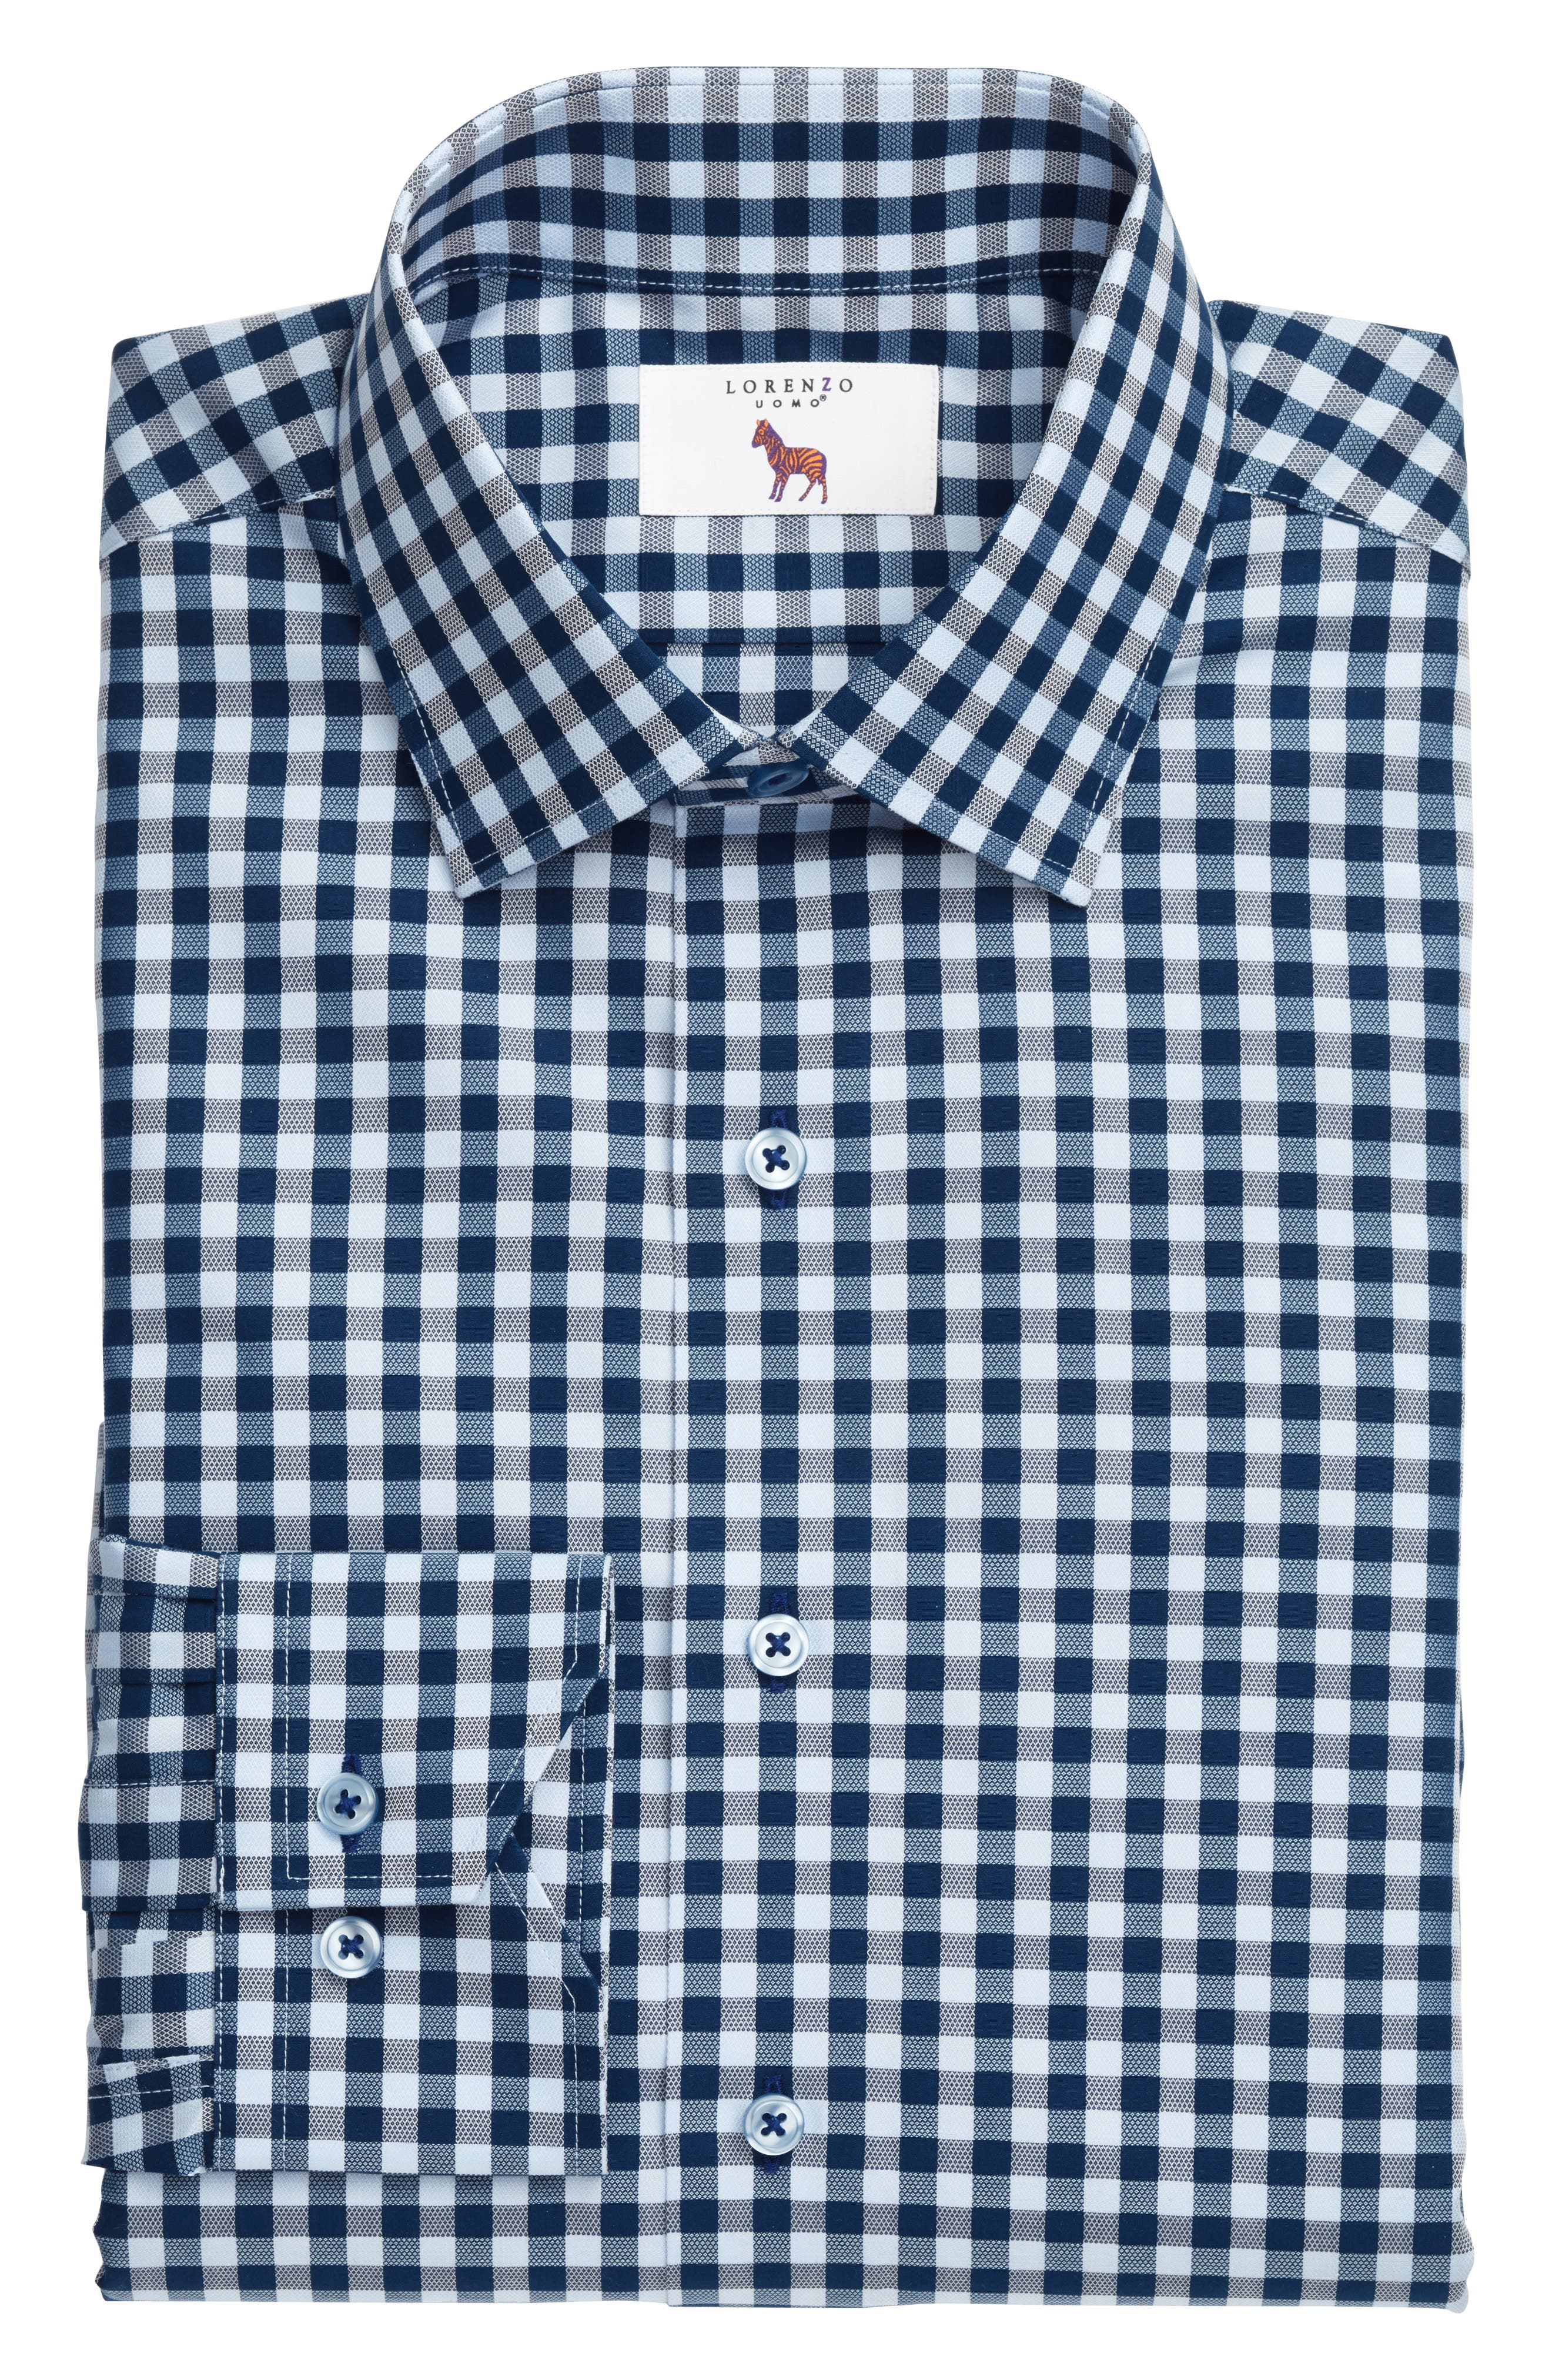 Trim Fit Check Dress Shirt,                             Alternate thumbnail 3, color,                             NAVY